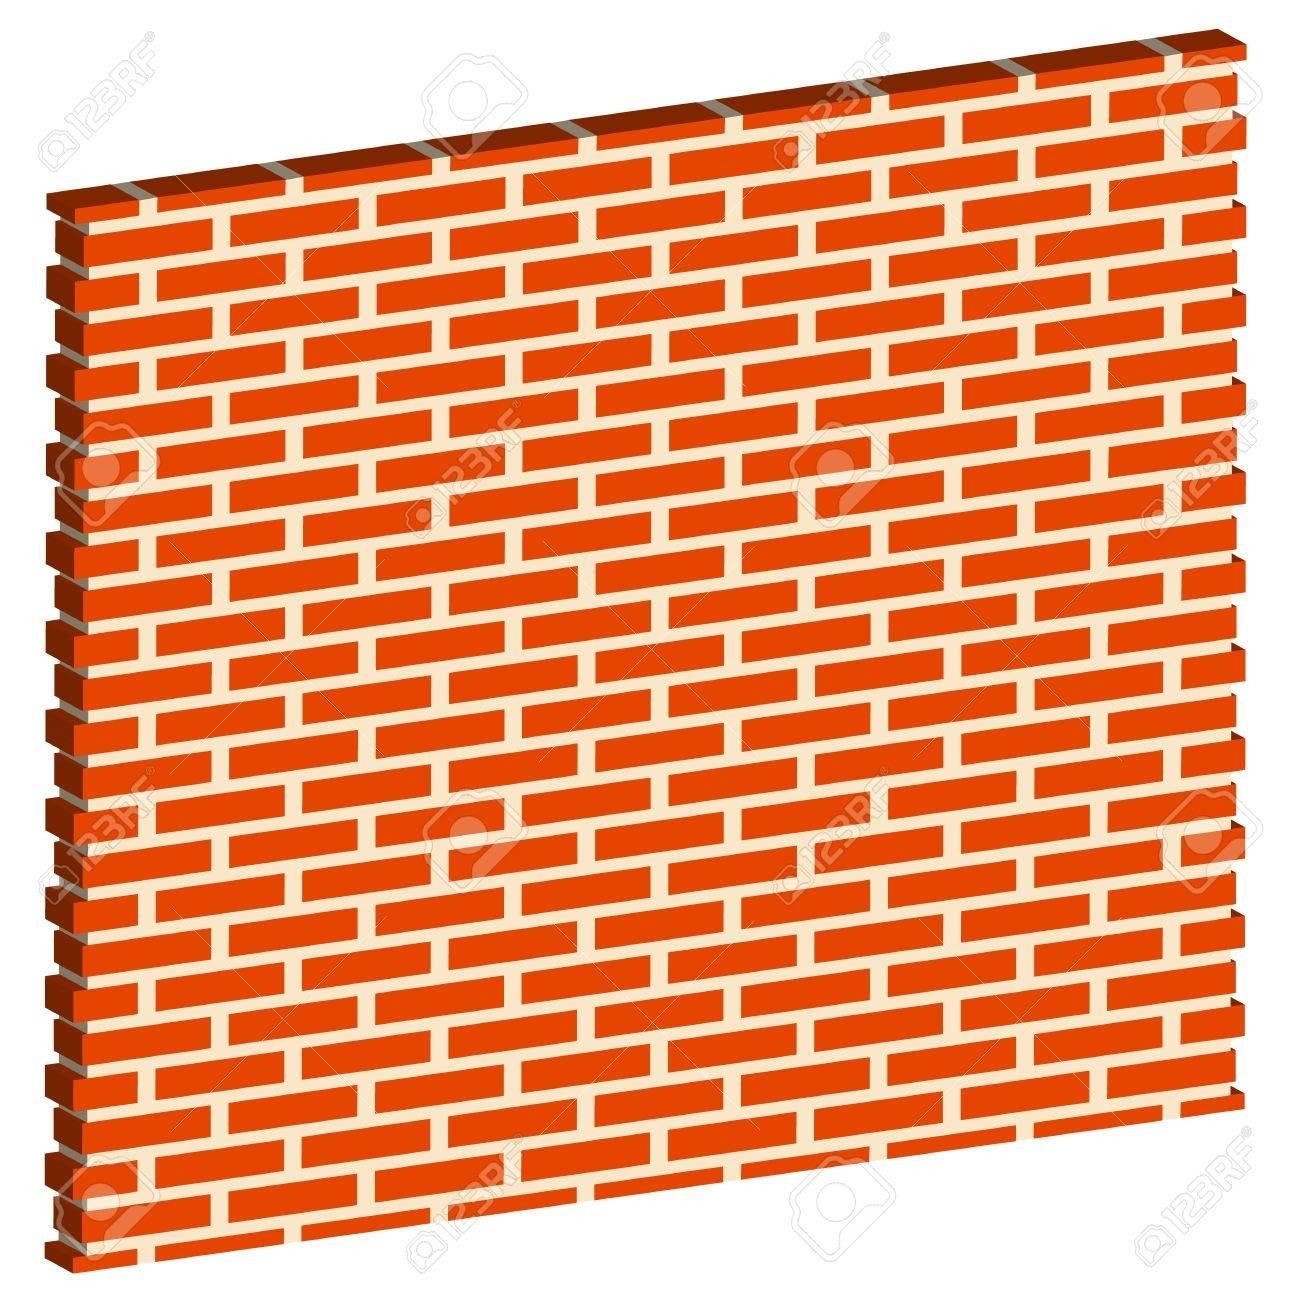 Wall clipart. Photos of d brick